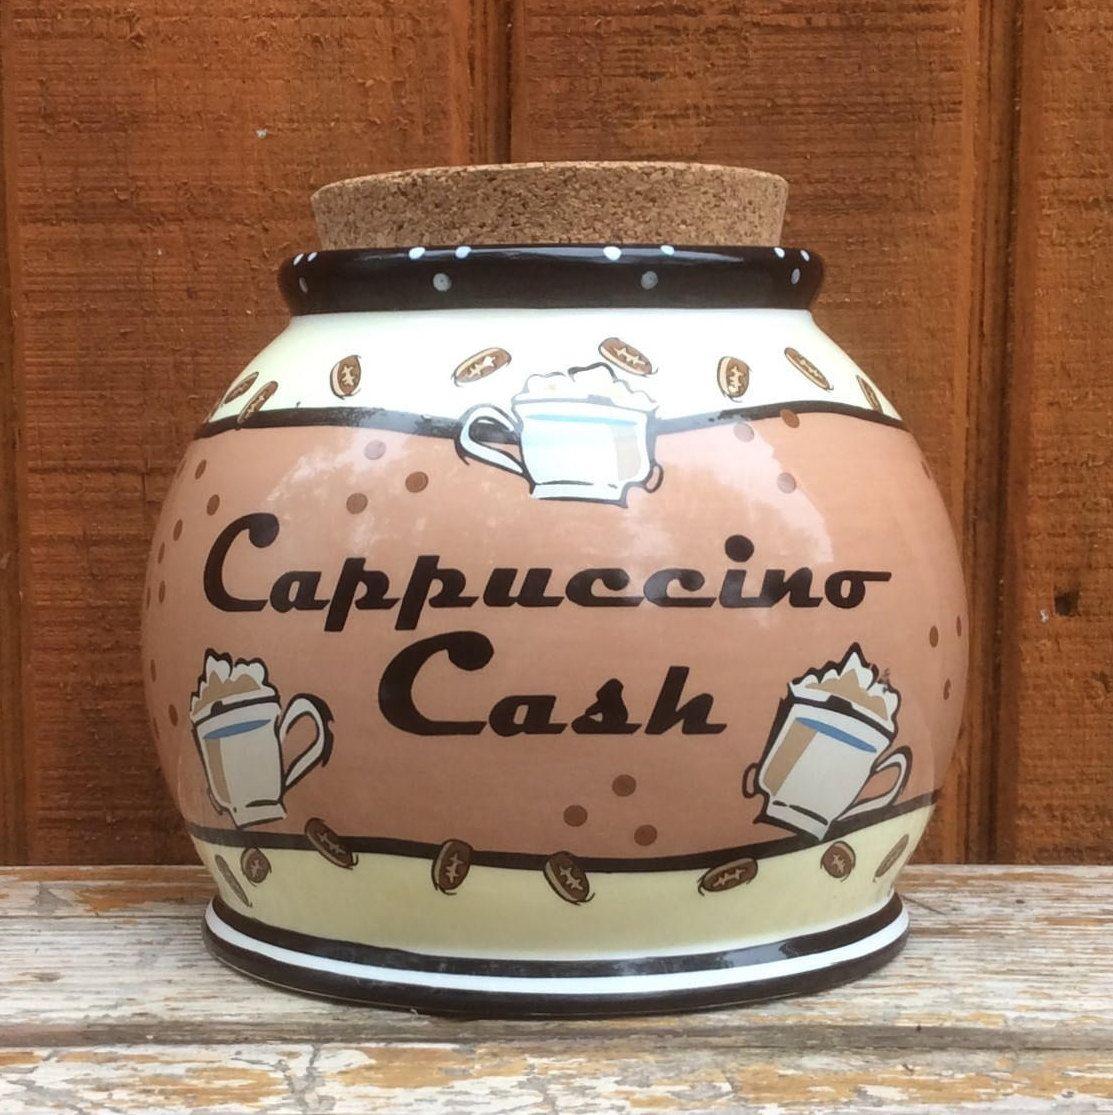 bella cassa cappuccino cash coffee storage container bank signed pottery jar and cork lid ceramic - Cork Cafe Decor